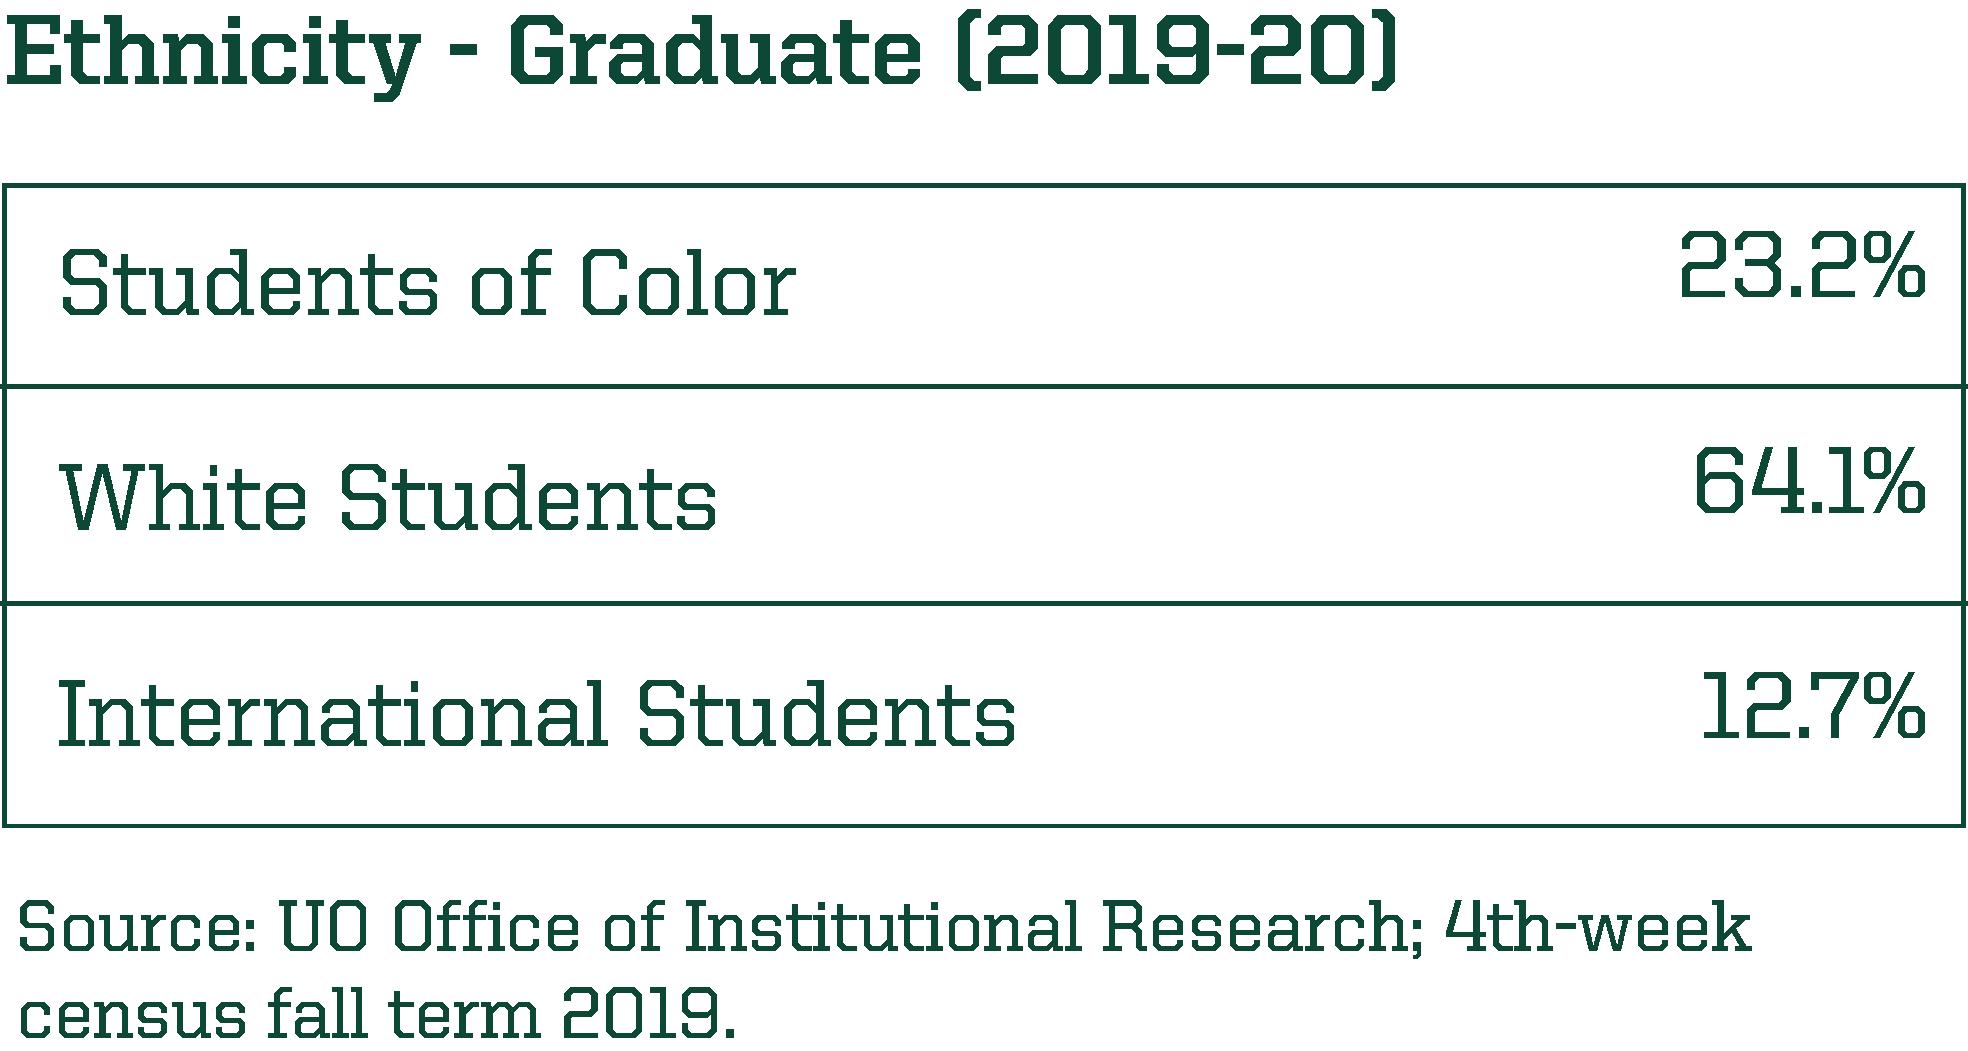 Ethnicity Breakdown, Graduate Students